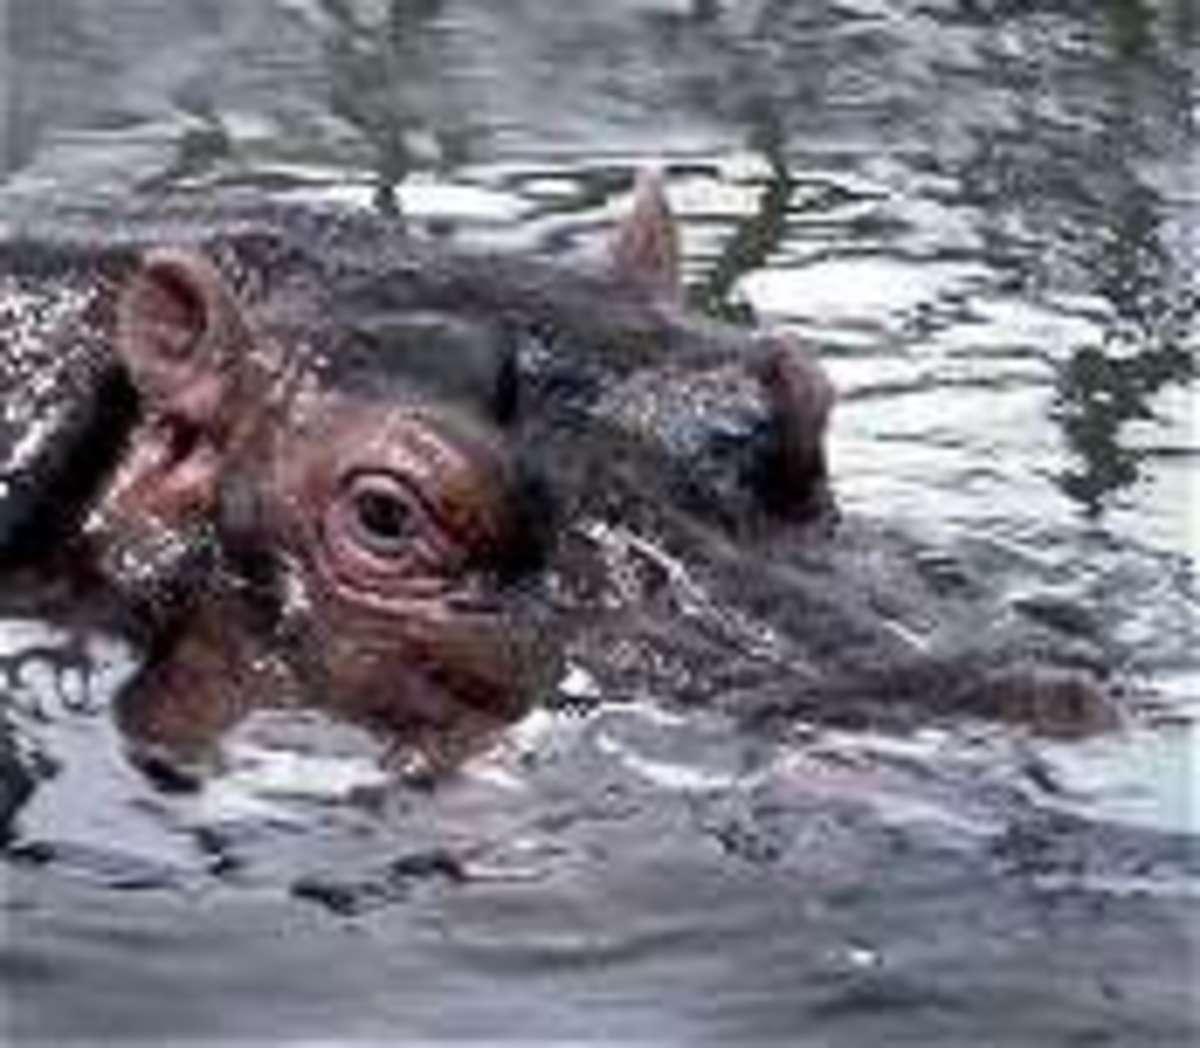 Kley area Hippopotamus from meskerparkzoo.com